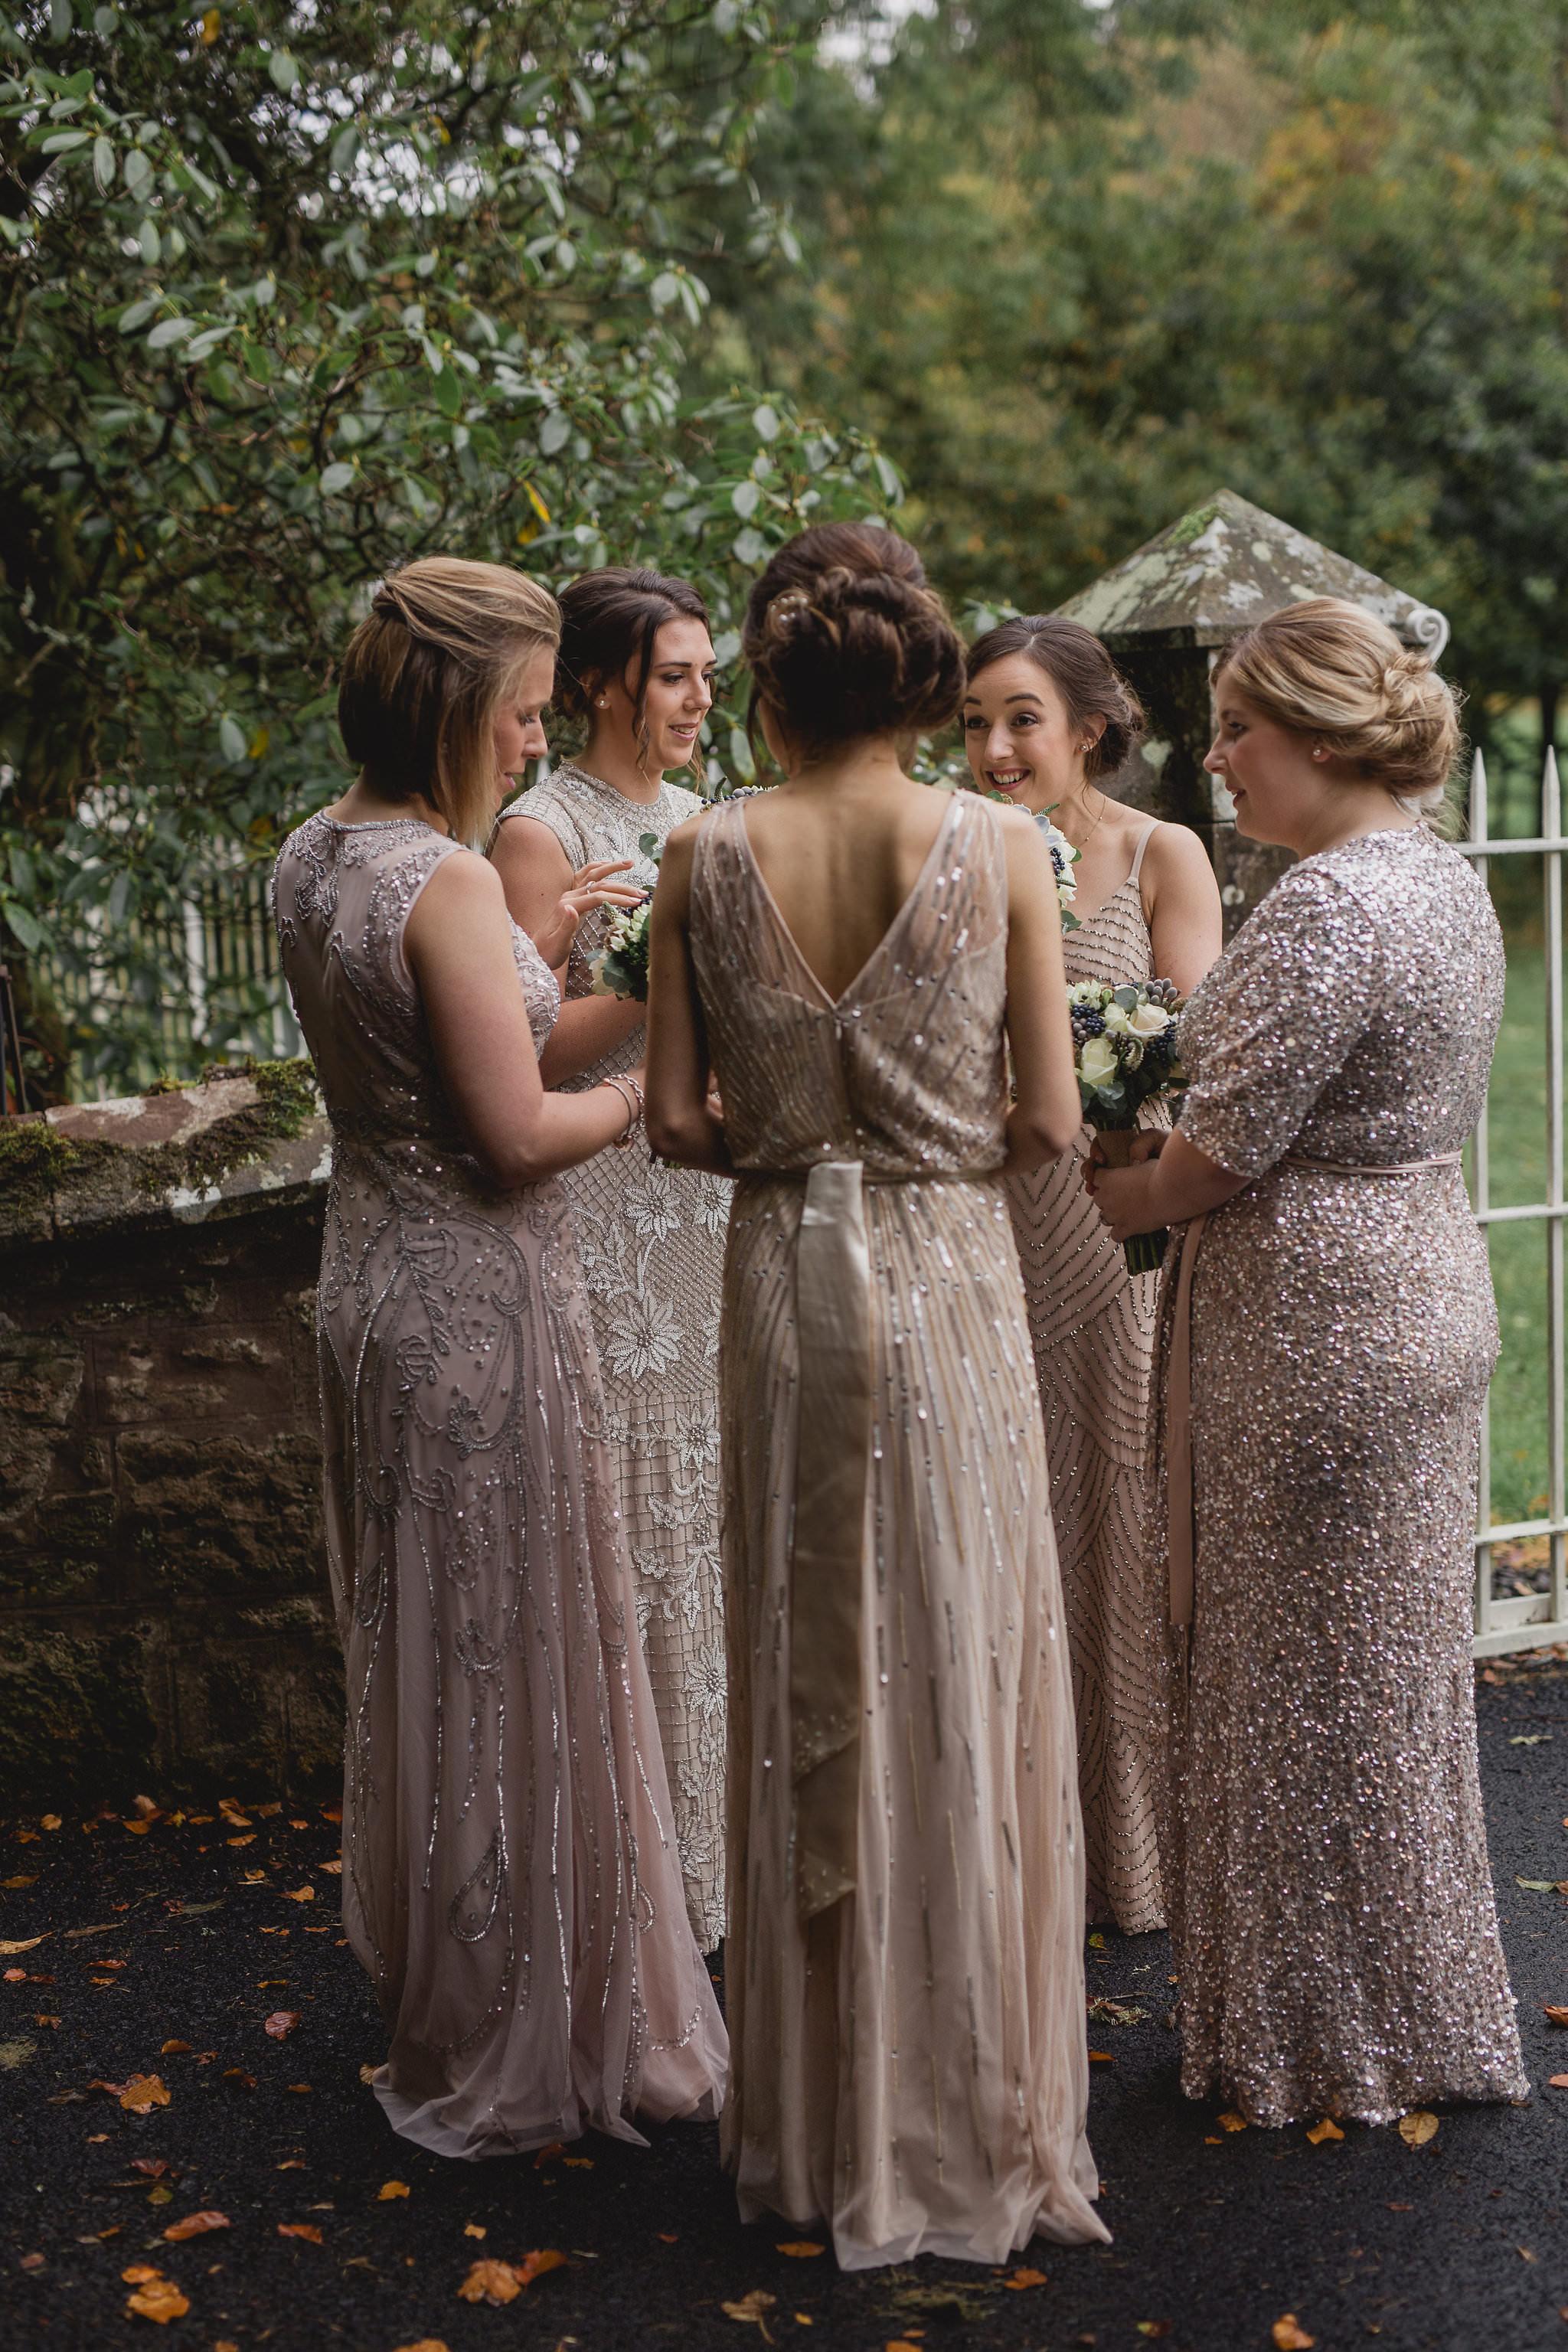 Fairytale Wedding at Drumtochty Castle, Scotland with Ian Stuart Gown